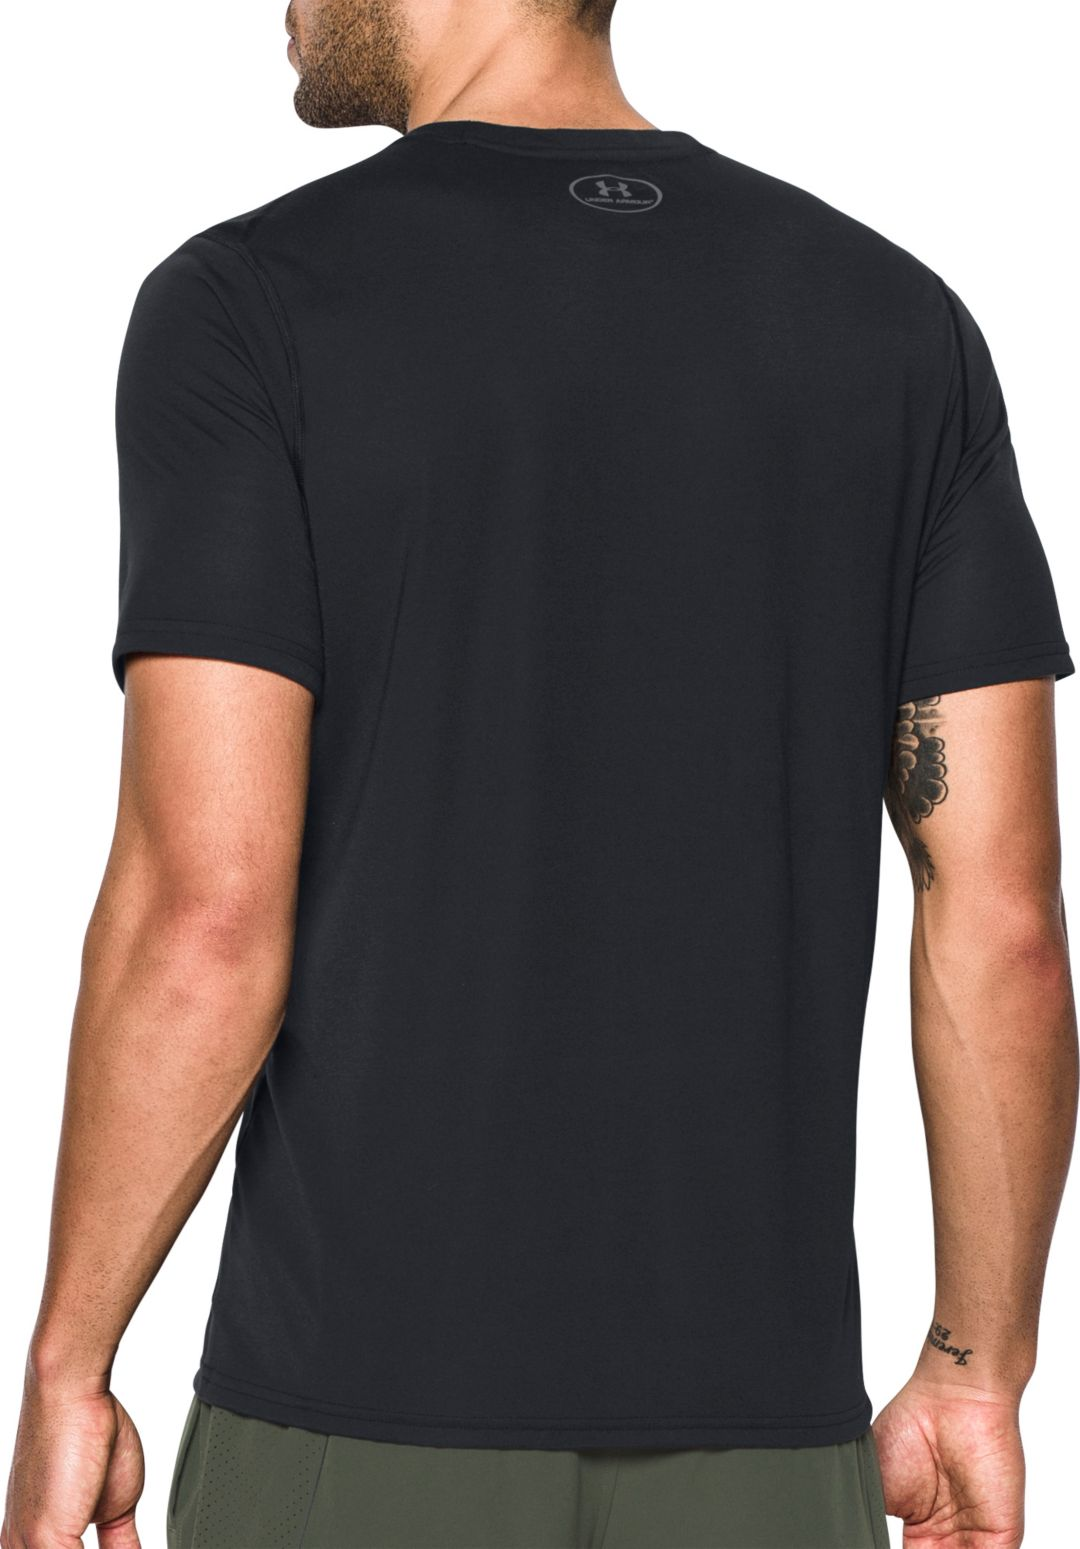 311af49c9a Under Armour Men's Threadborne Siro T-Shirt